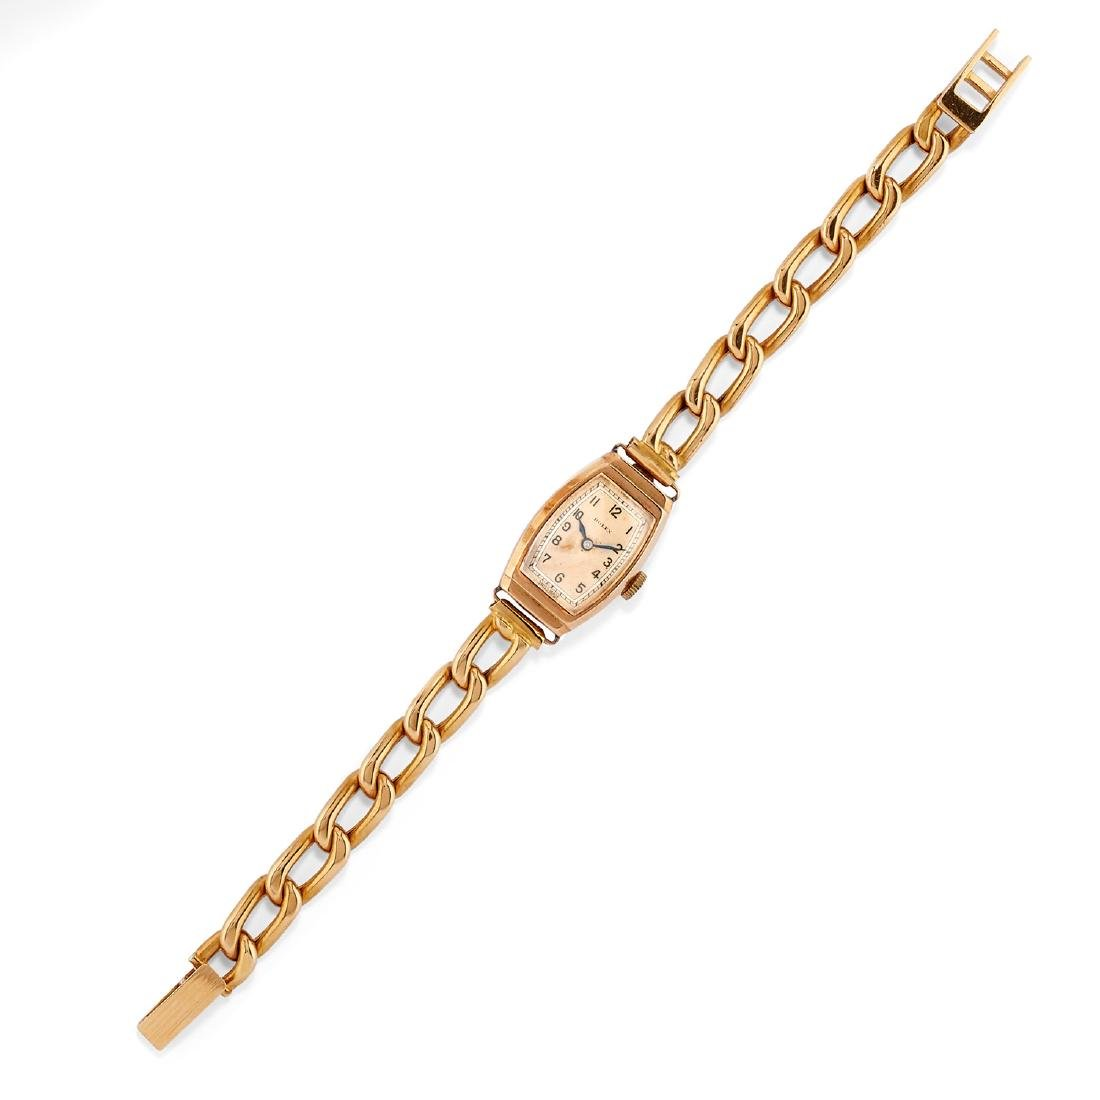 Rolex  - A 9K gold lady's wristwatch, Rolex